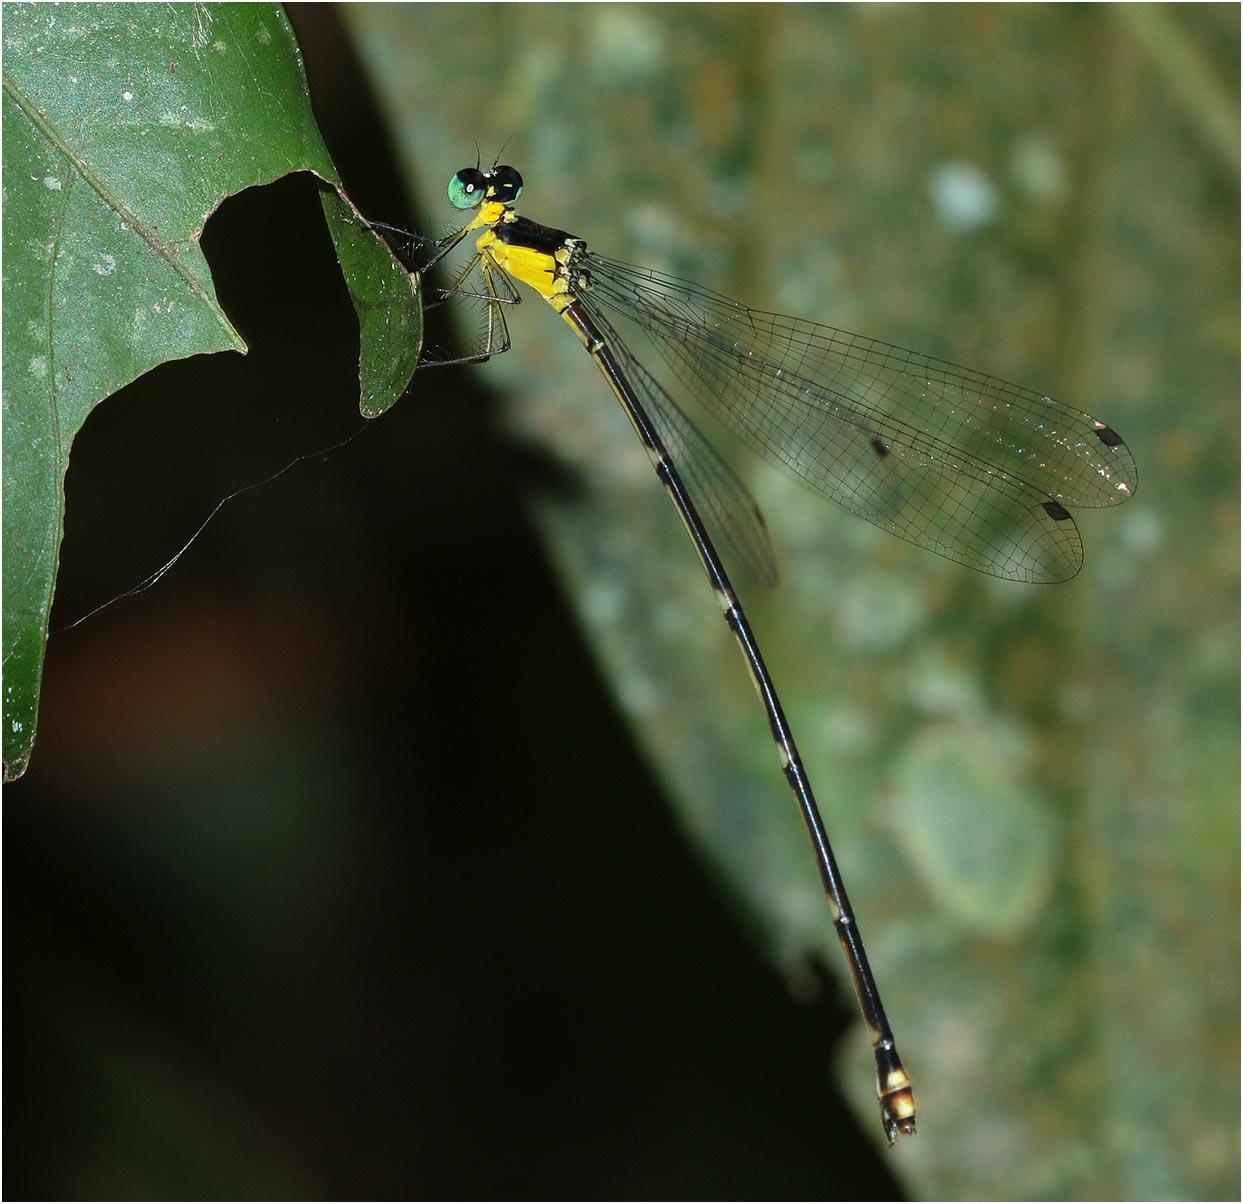 Coeliccia sasamotoi femelle, Vietnam, Xuan Son, 09/06/2018